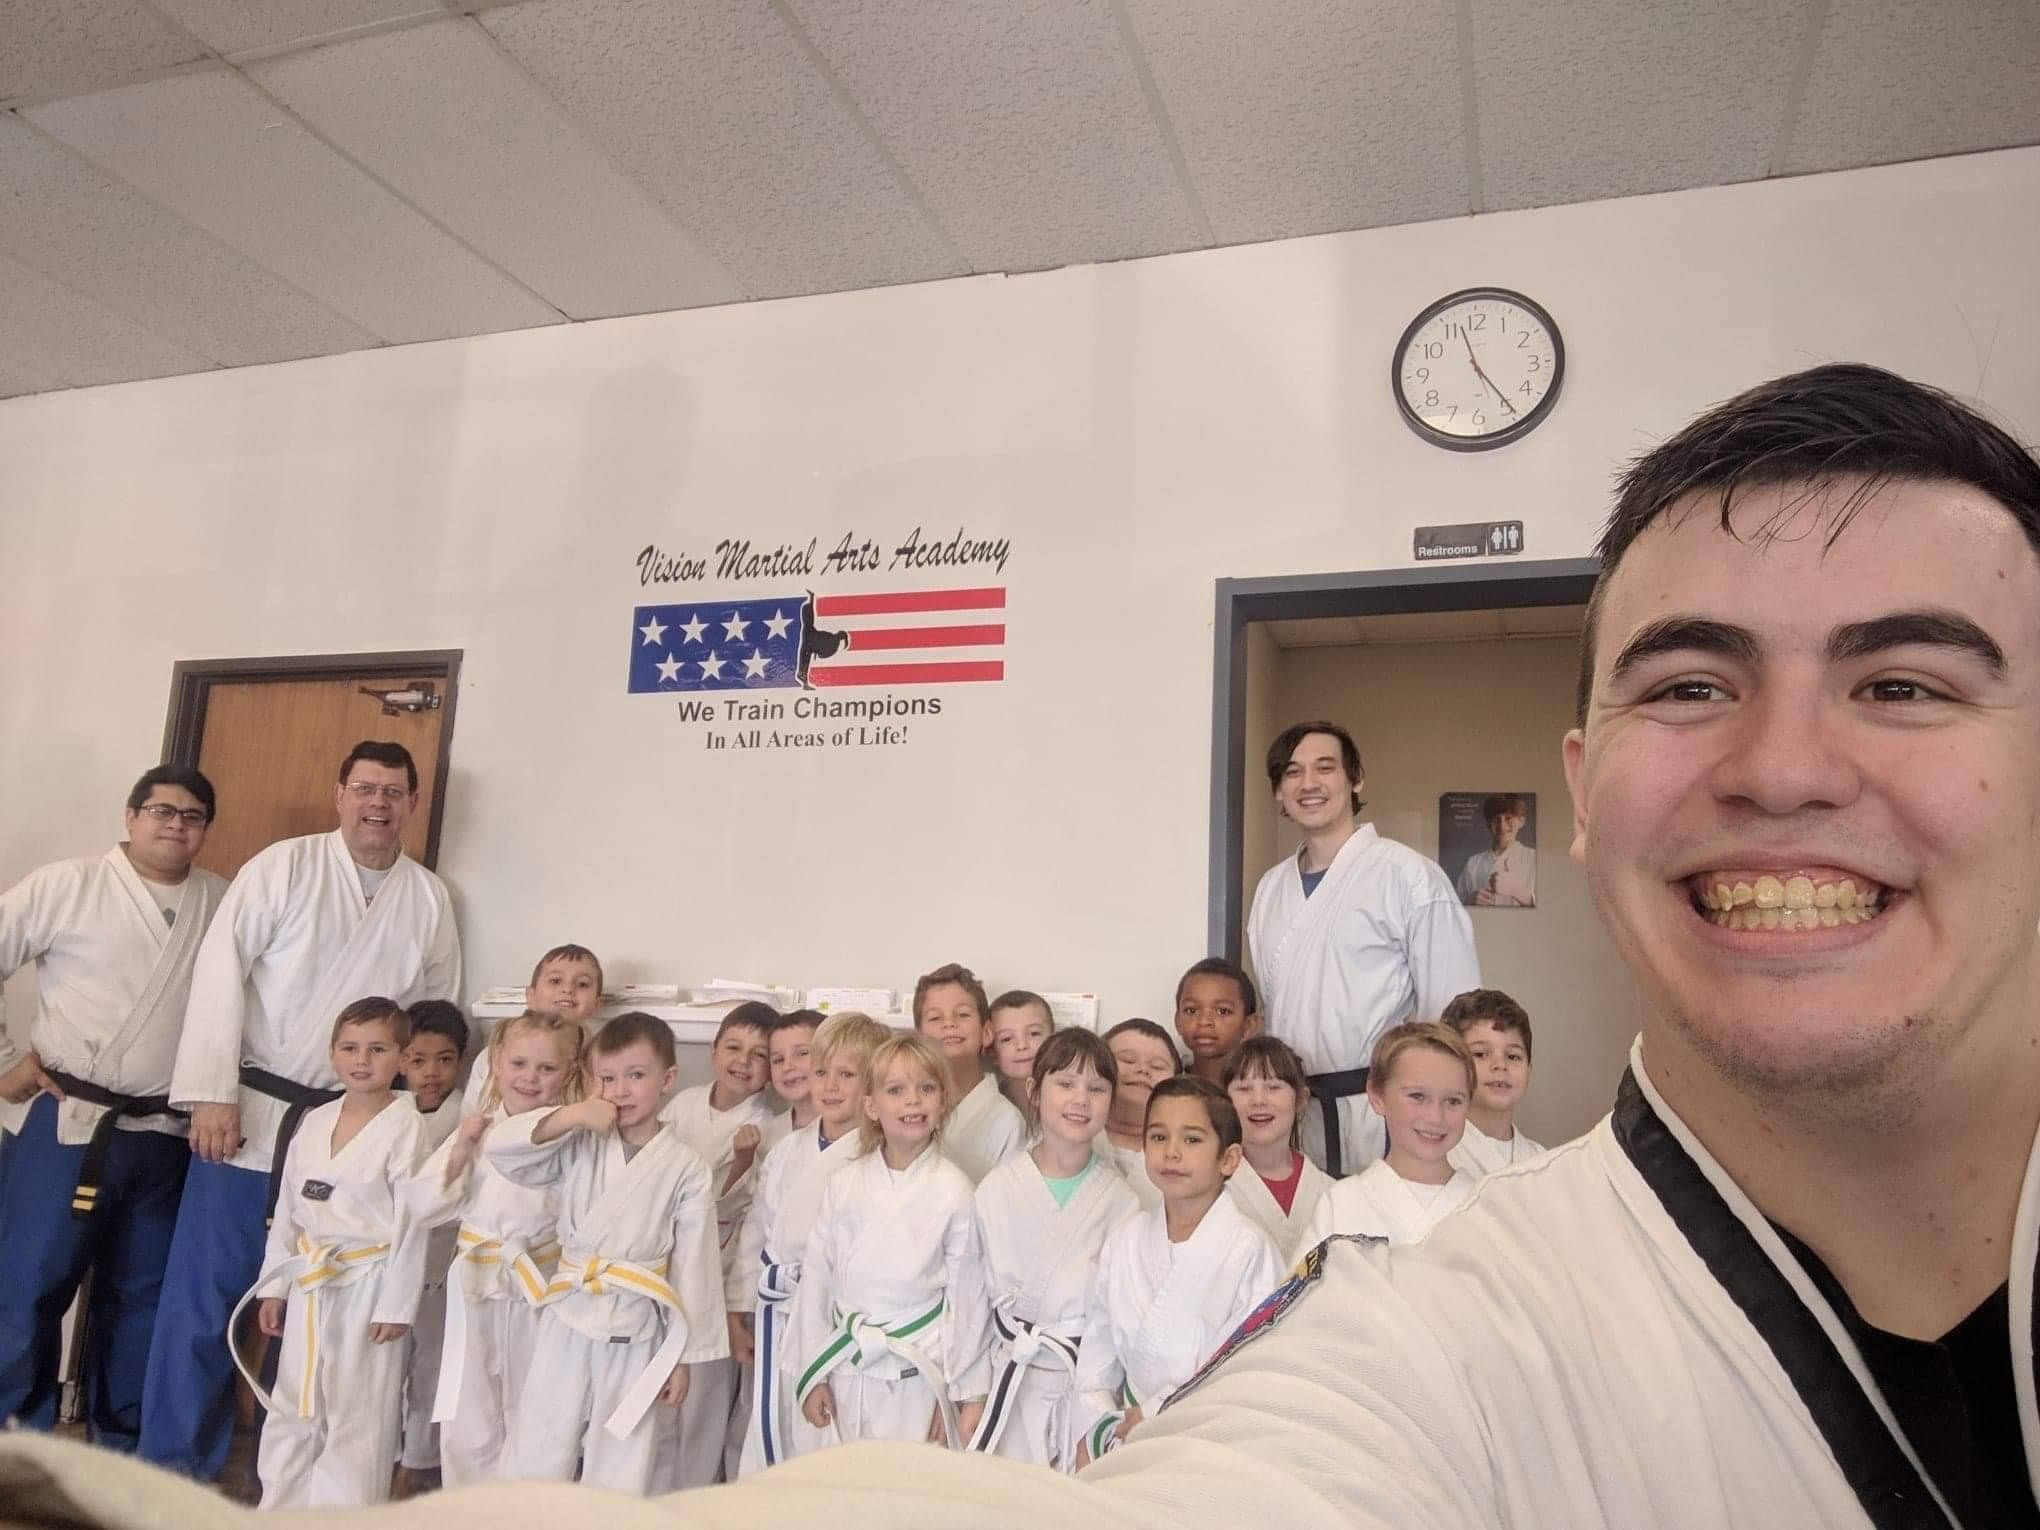 Oklahoma's Top Rated Local® Martial Arts Award Winner: Vision Martial Arts Academy